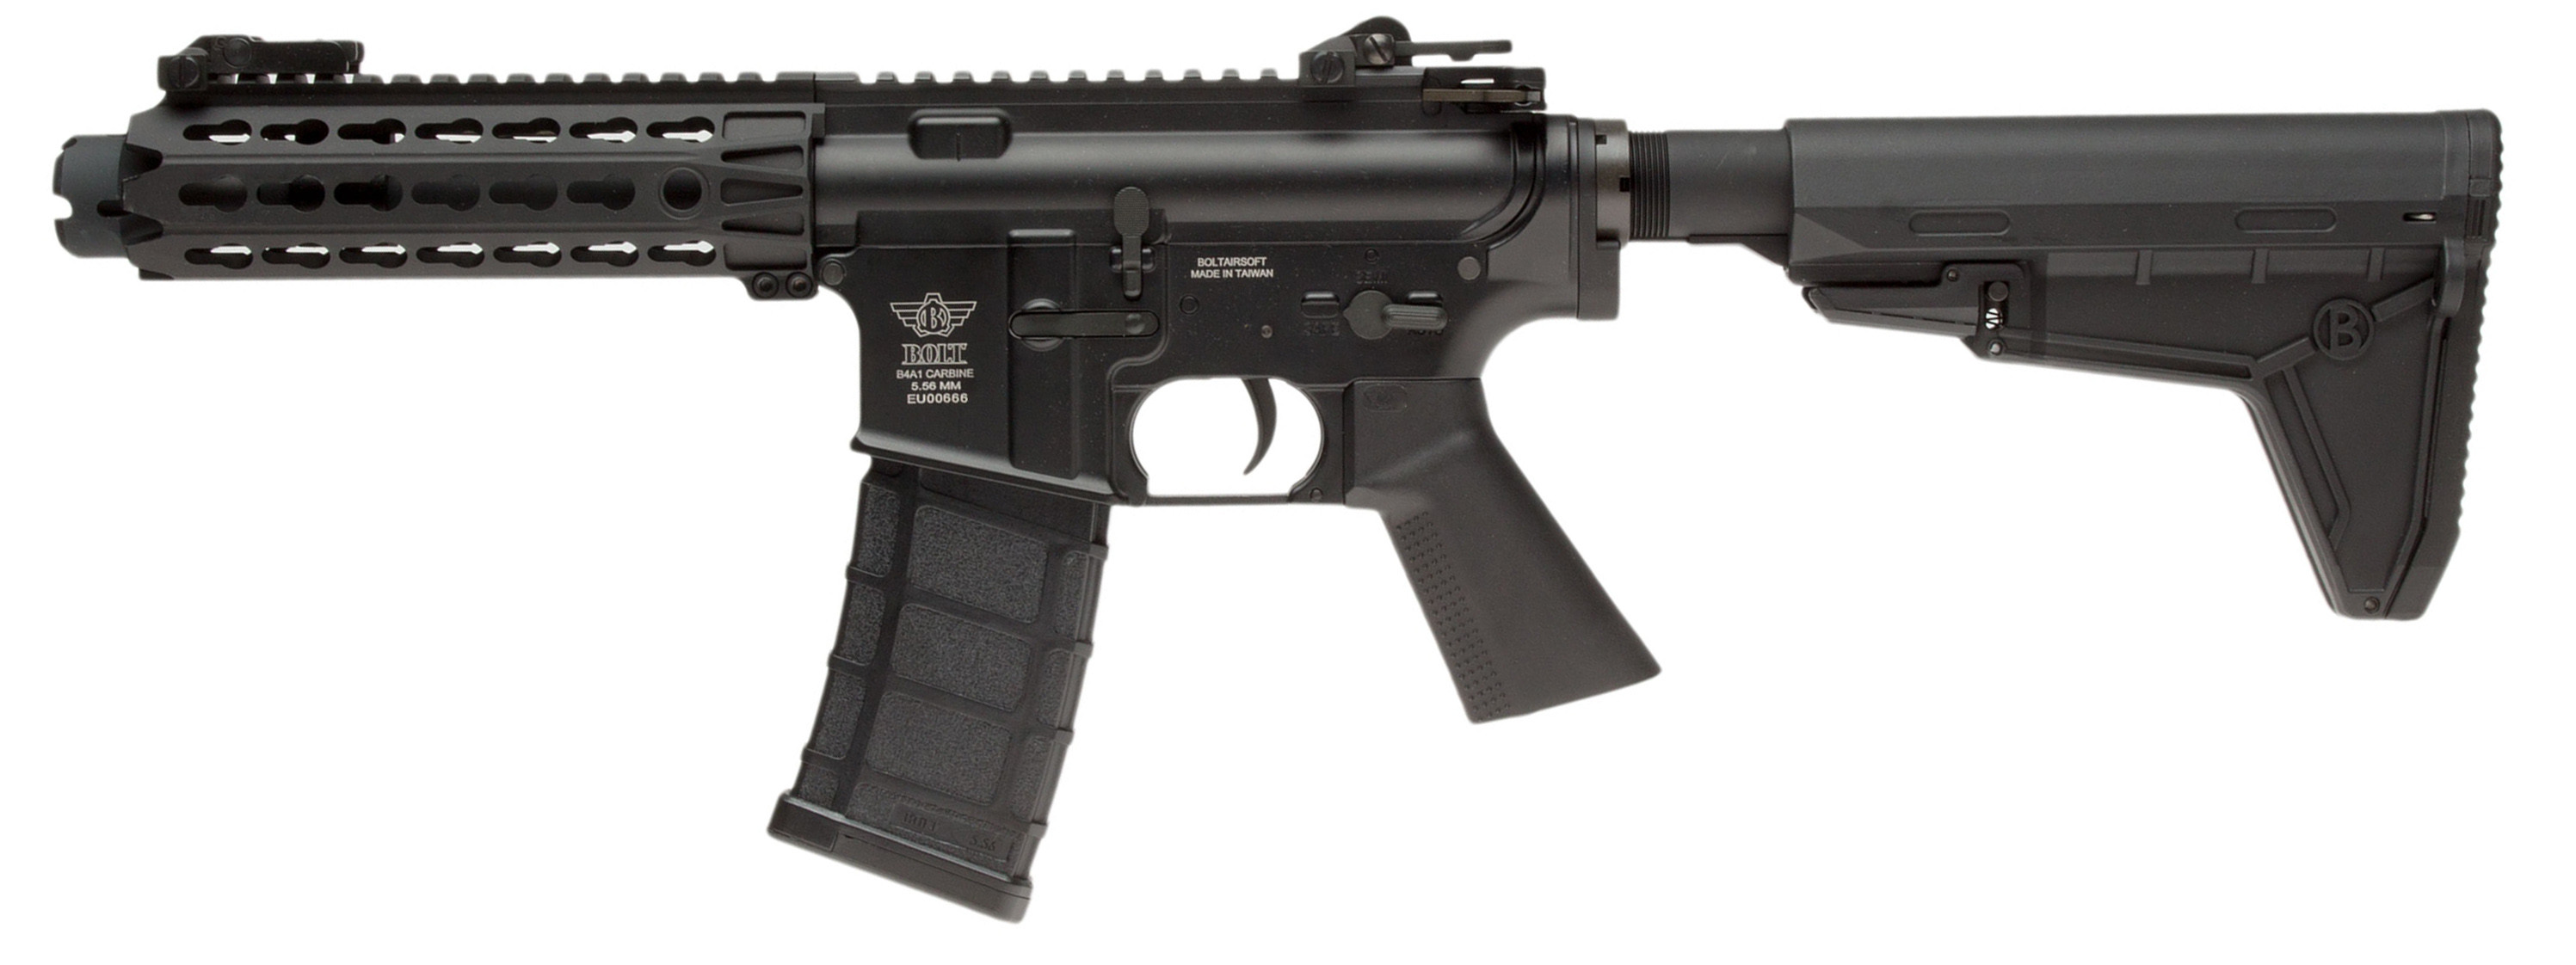 Bolt B4 Rebel - EBB Airsoft Rifle